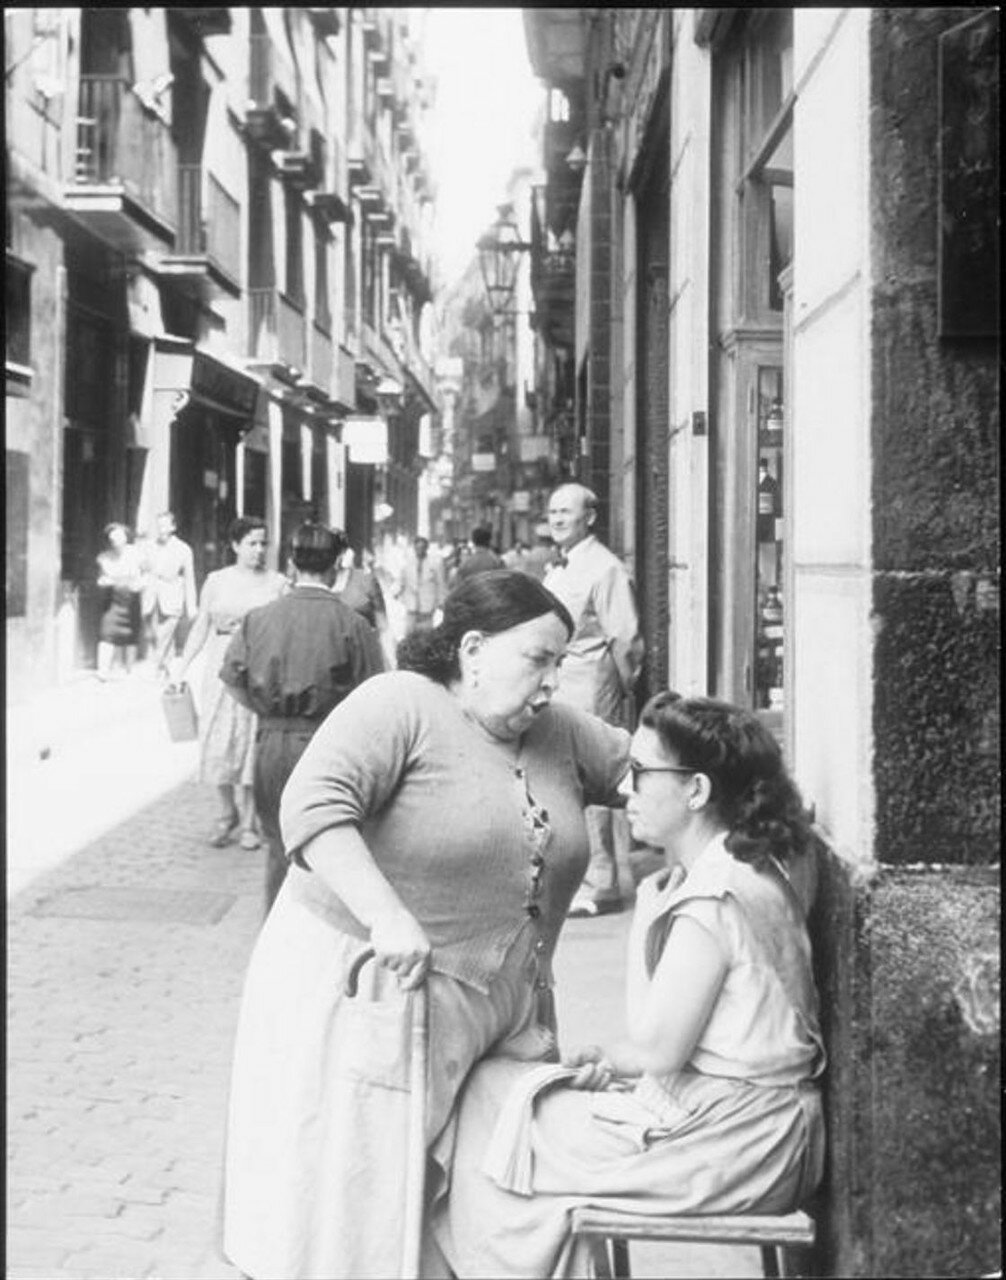 1955. ���� ���� (��������) �� ����� ������ � ���������